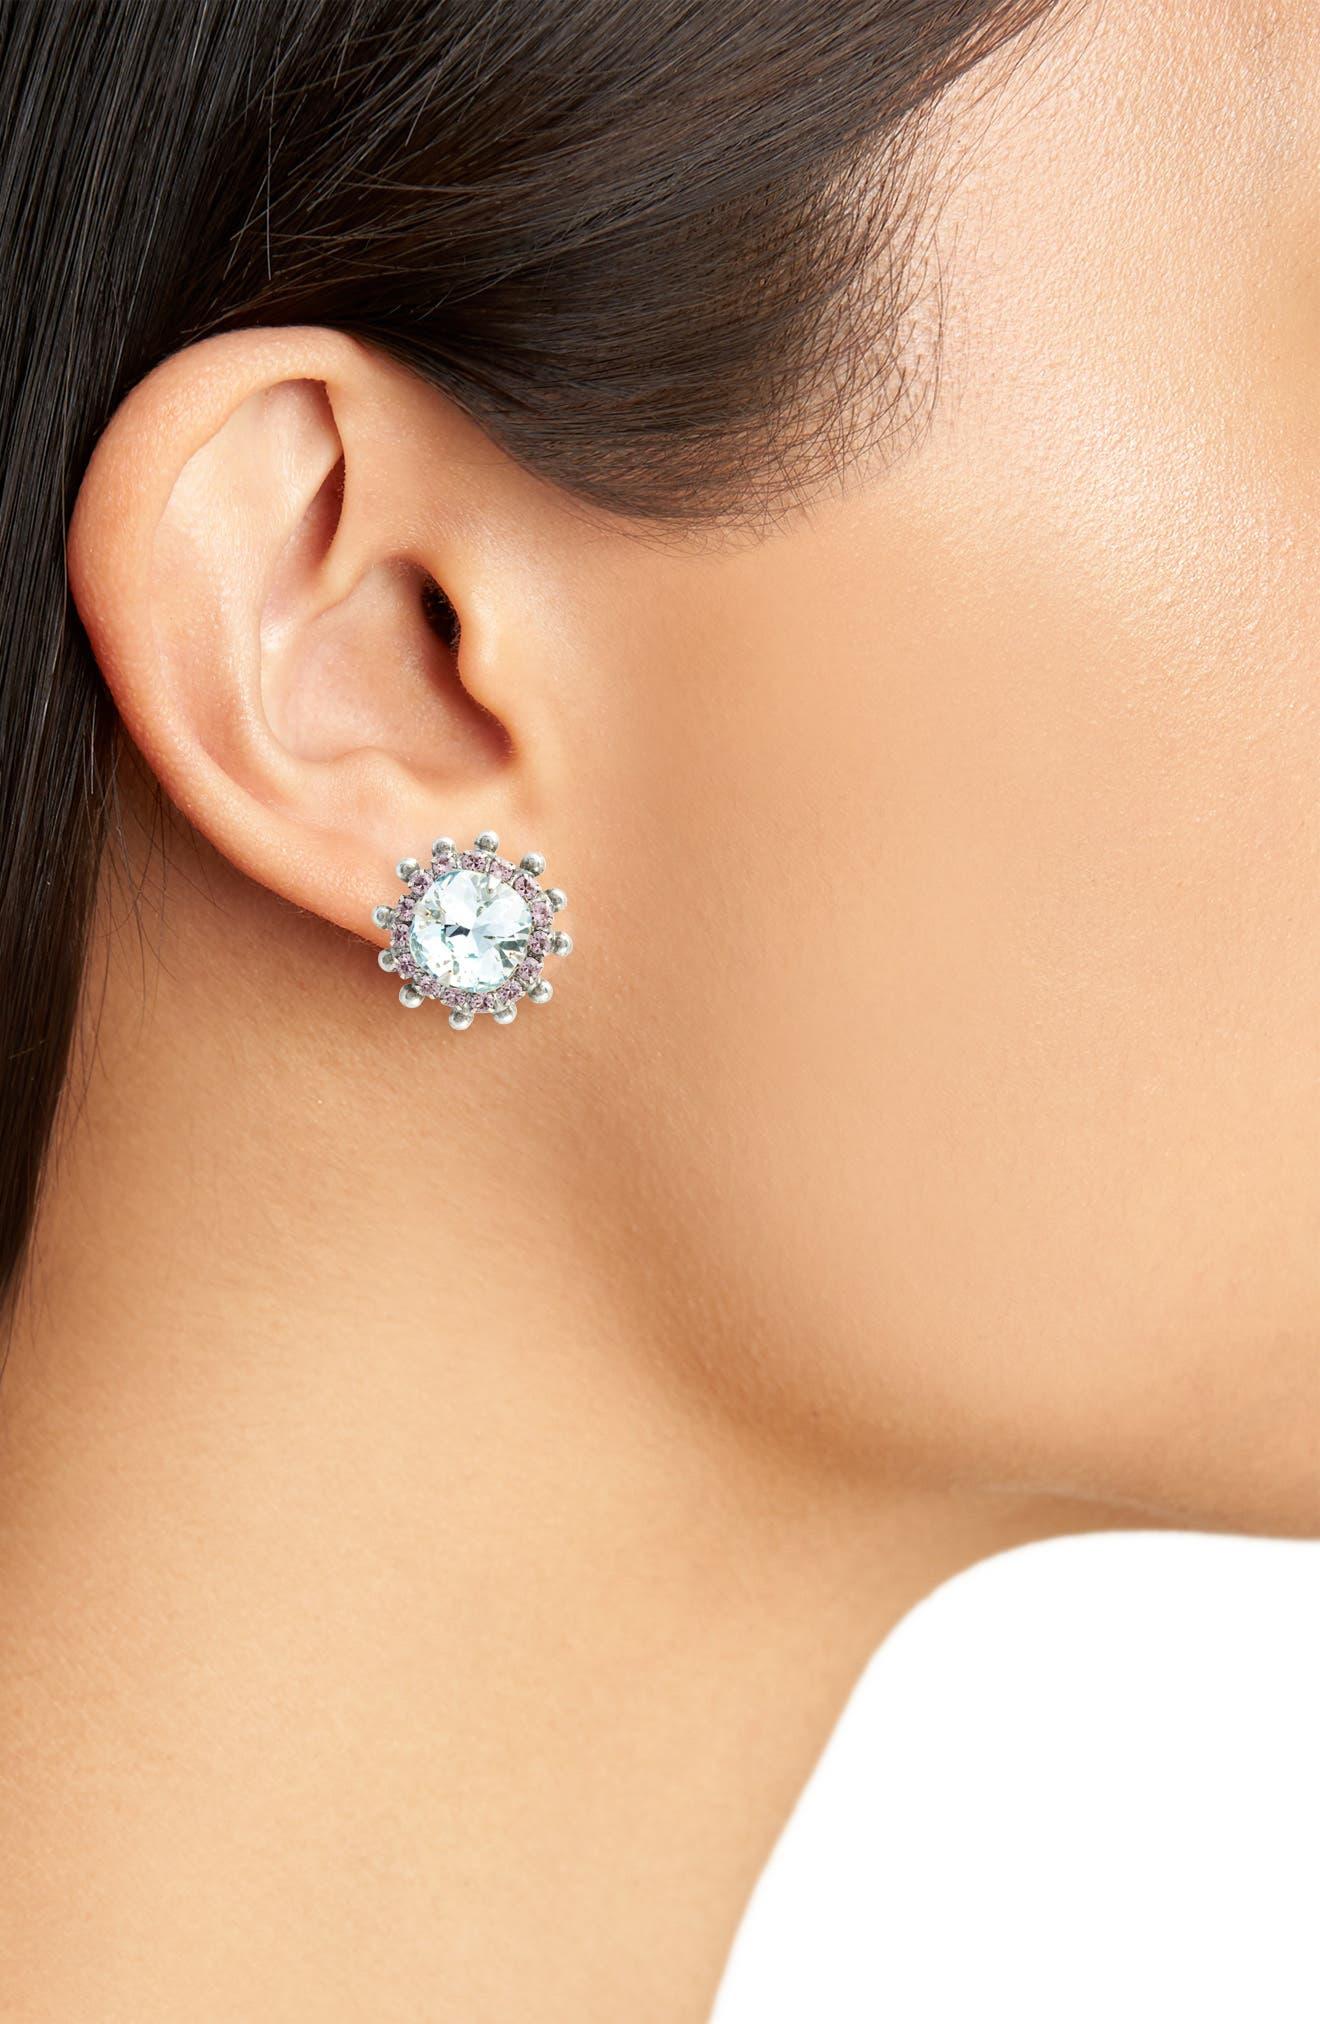 Protea Donna Crystal Earrings,                             Alternate thumbnail 2, color,                             401